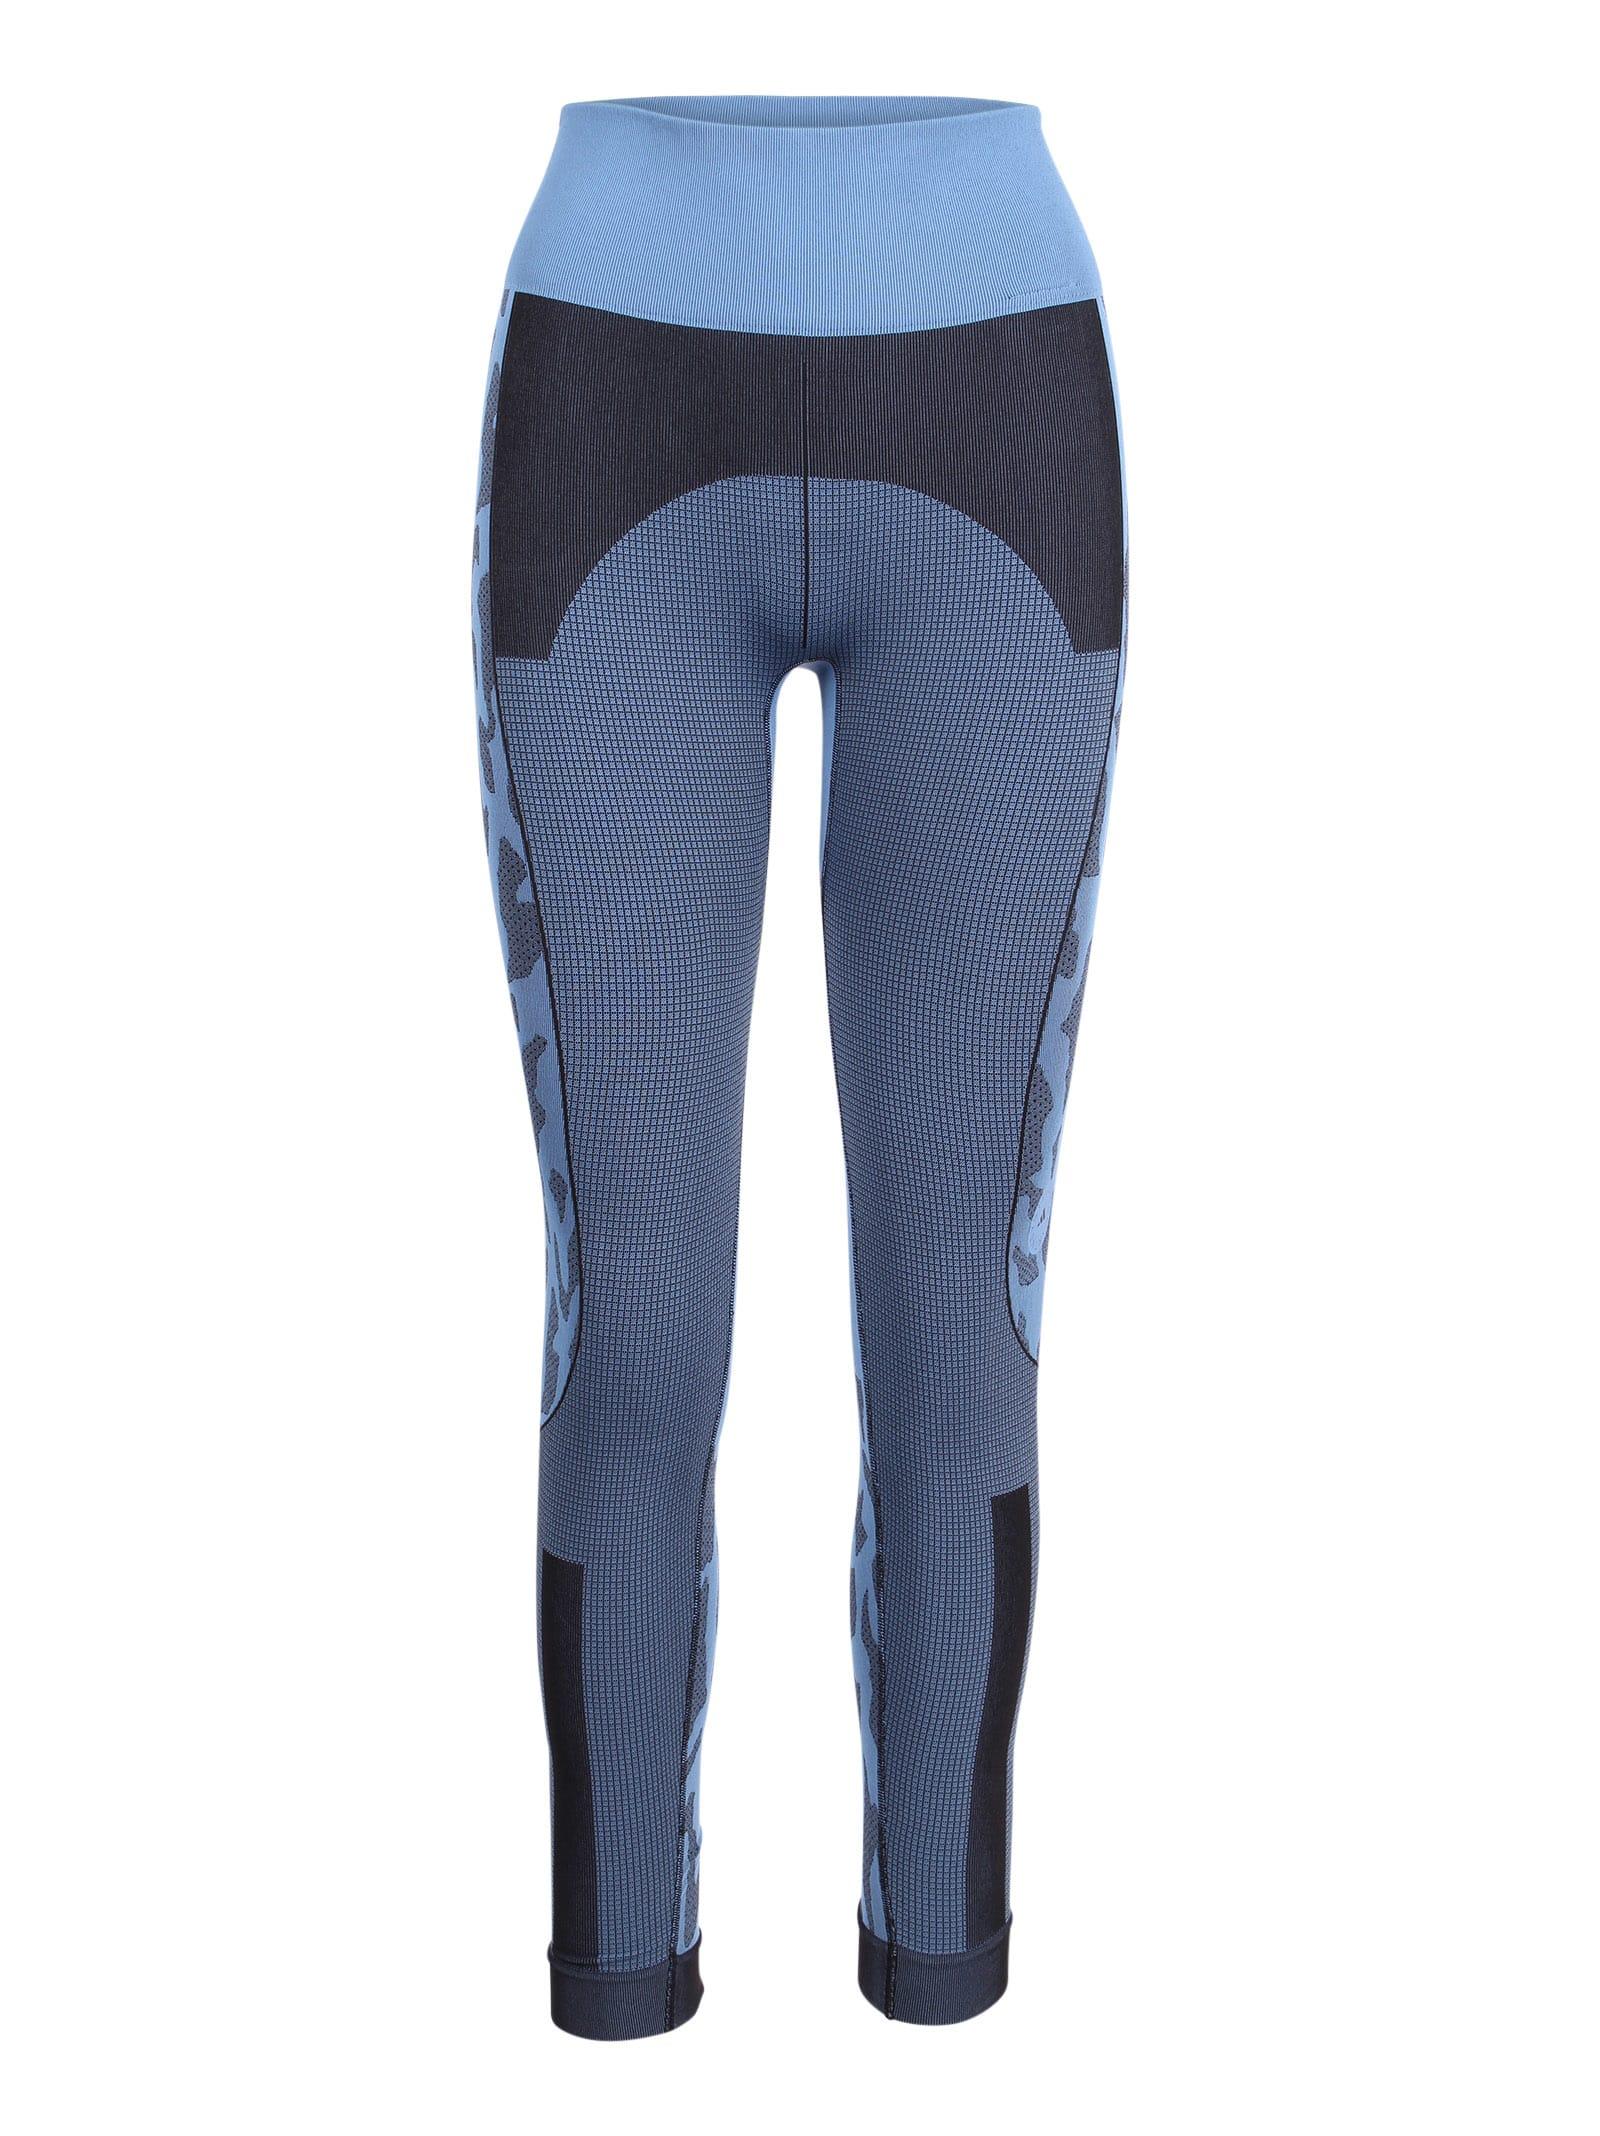 Adidas By Stella Mccartney Leggings TRUEPURPOSE SEAMLESS POLYESTER TIGHT